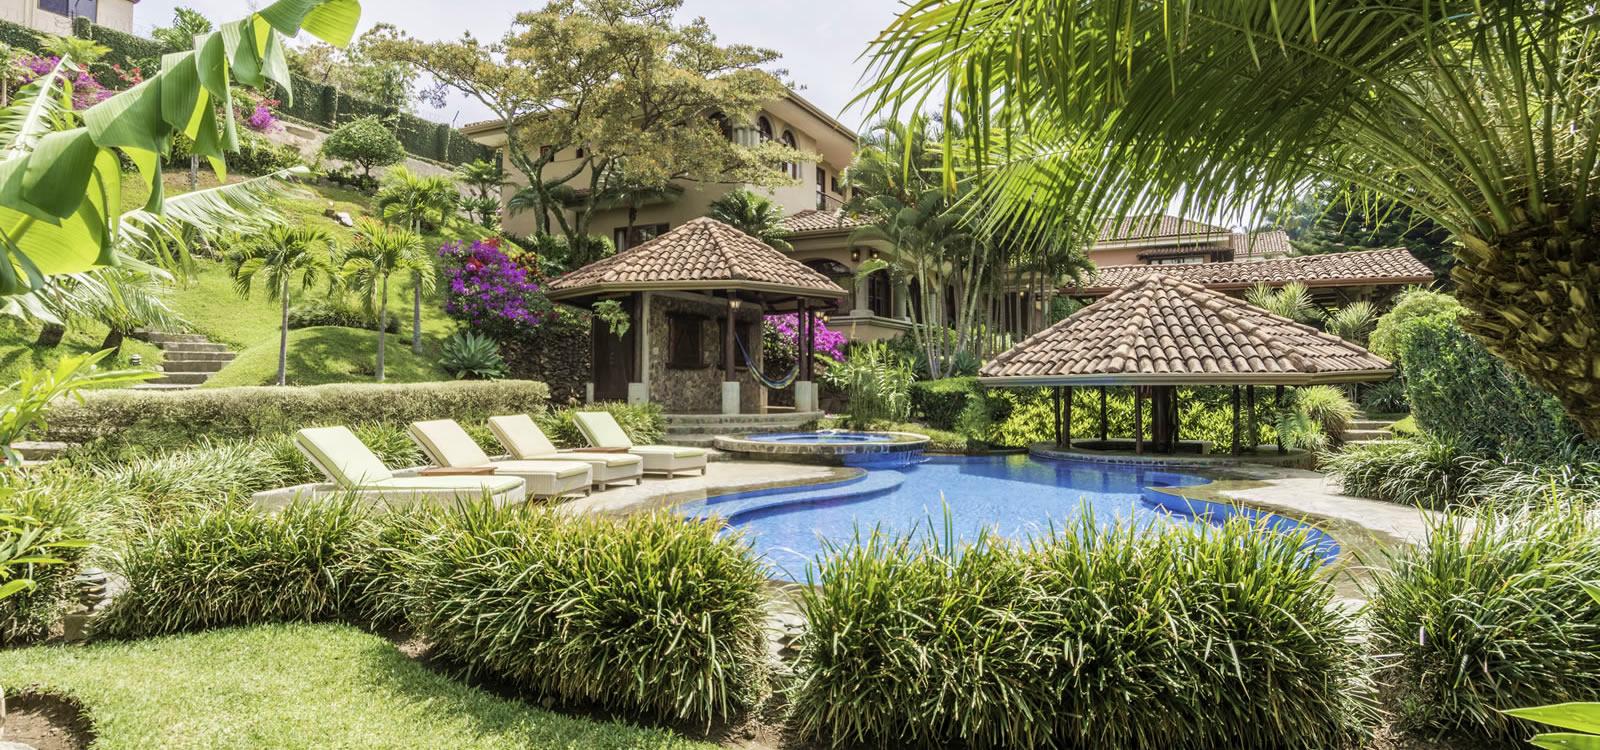 5 bedroom luxury villa for sale villa real santa ana for Luxury villa costa rica